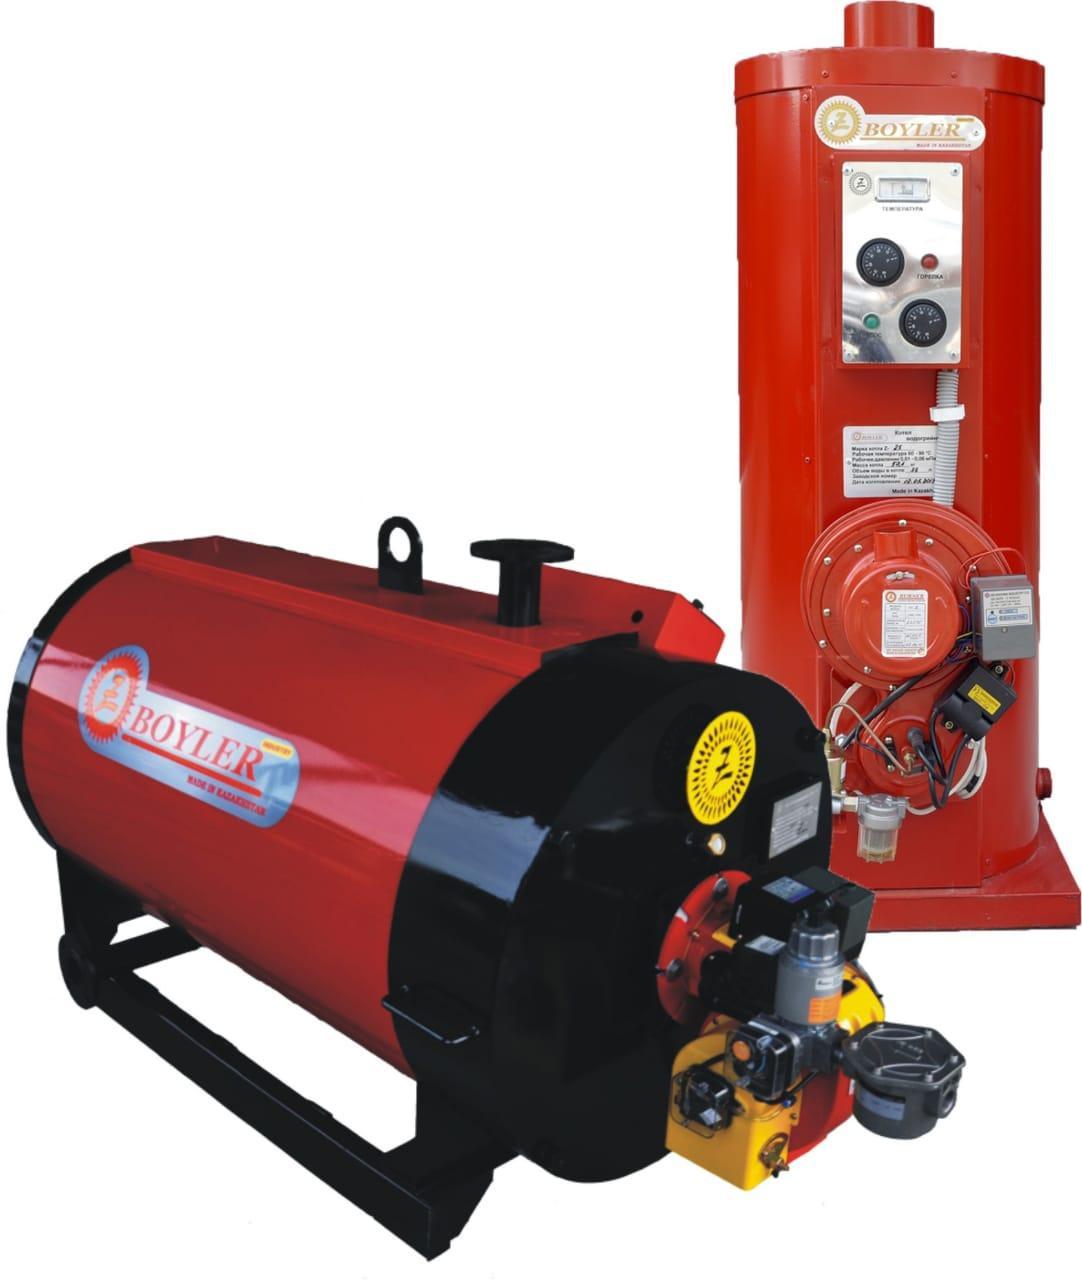 Напольные газовые котлы Z-400